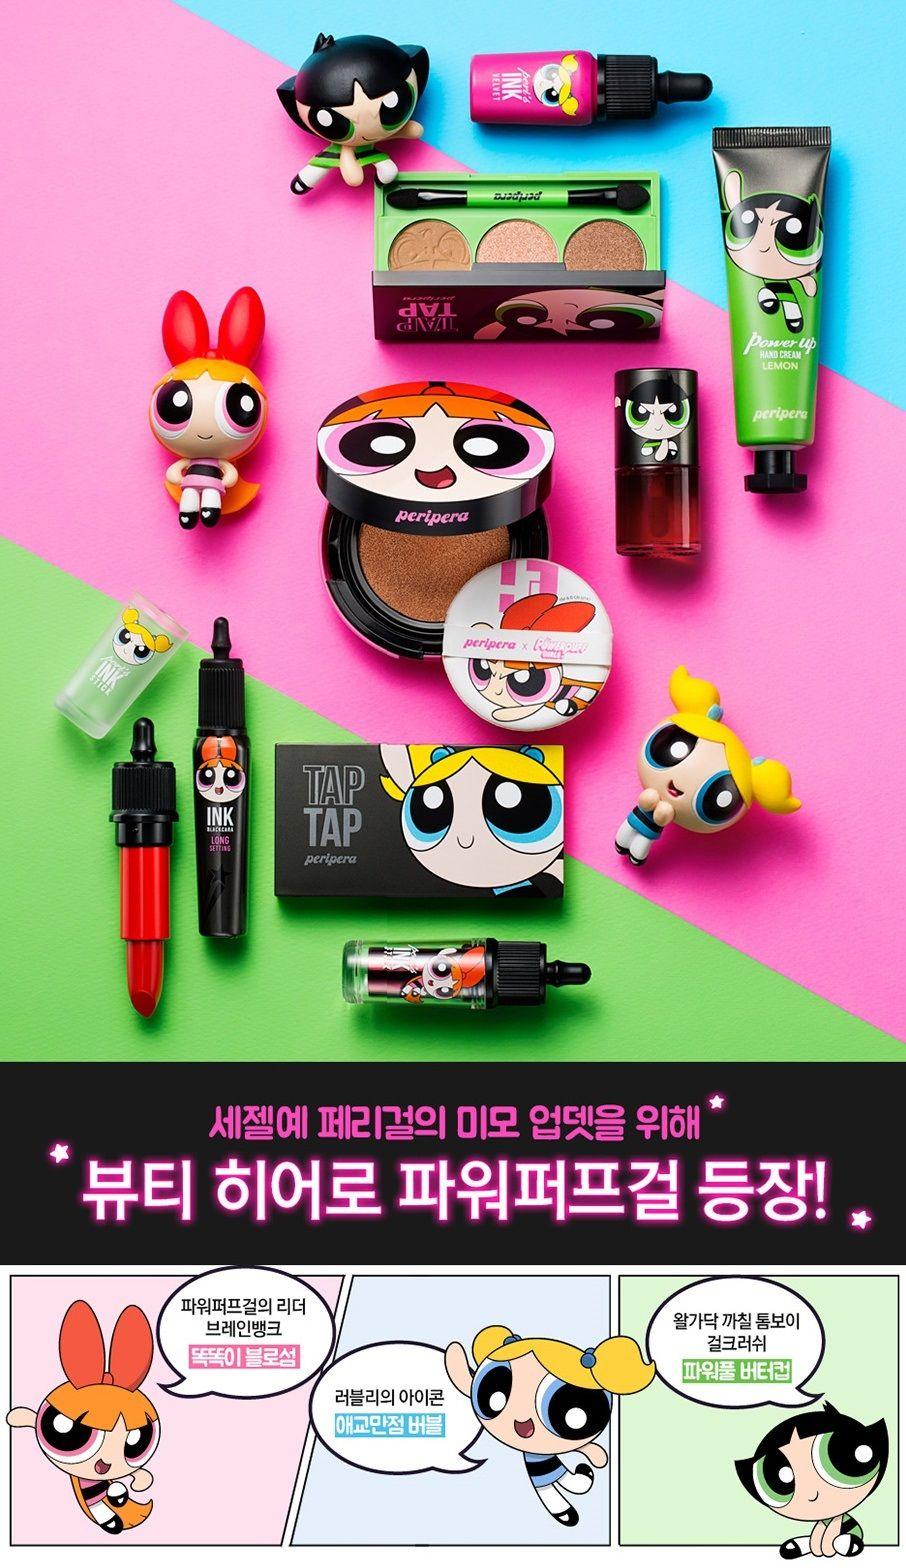 Tester Korea Cosmetics Sample Shop Cosmetics online